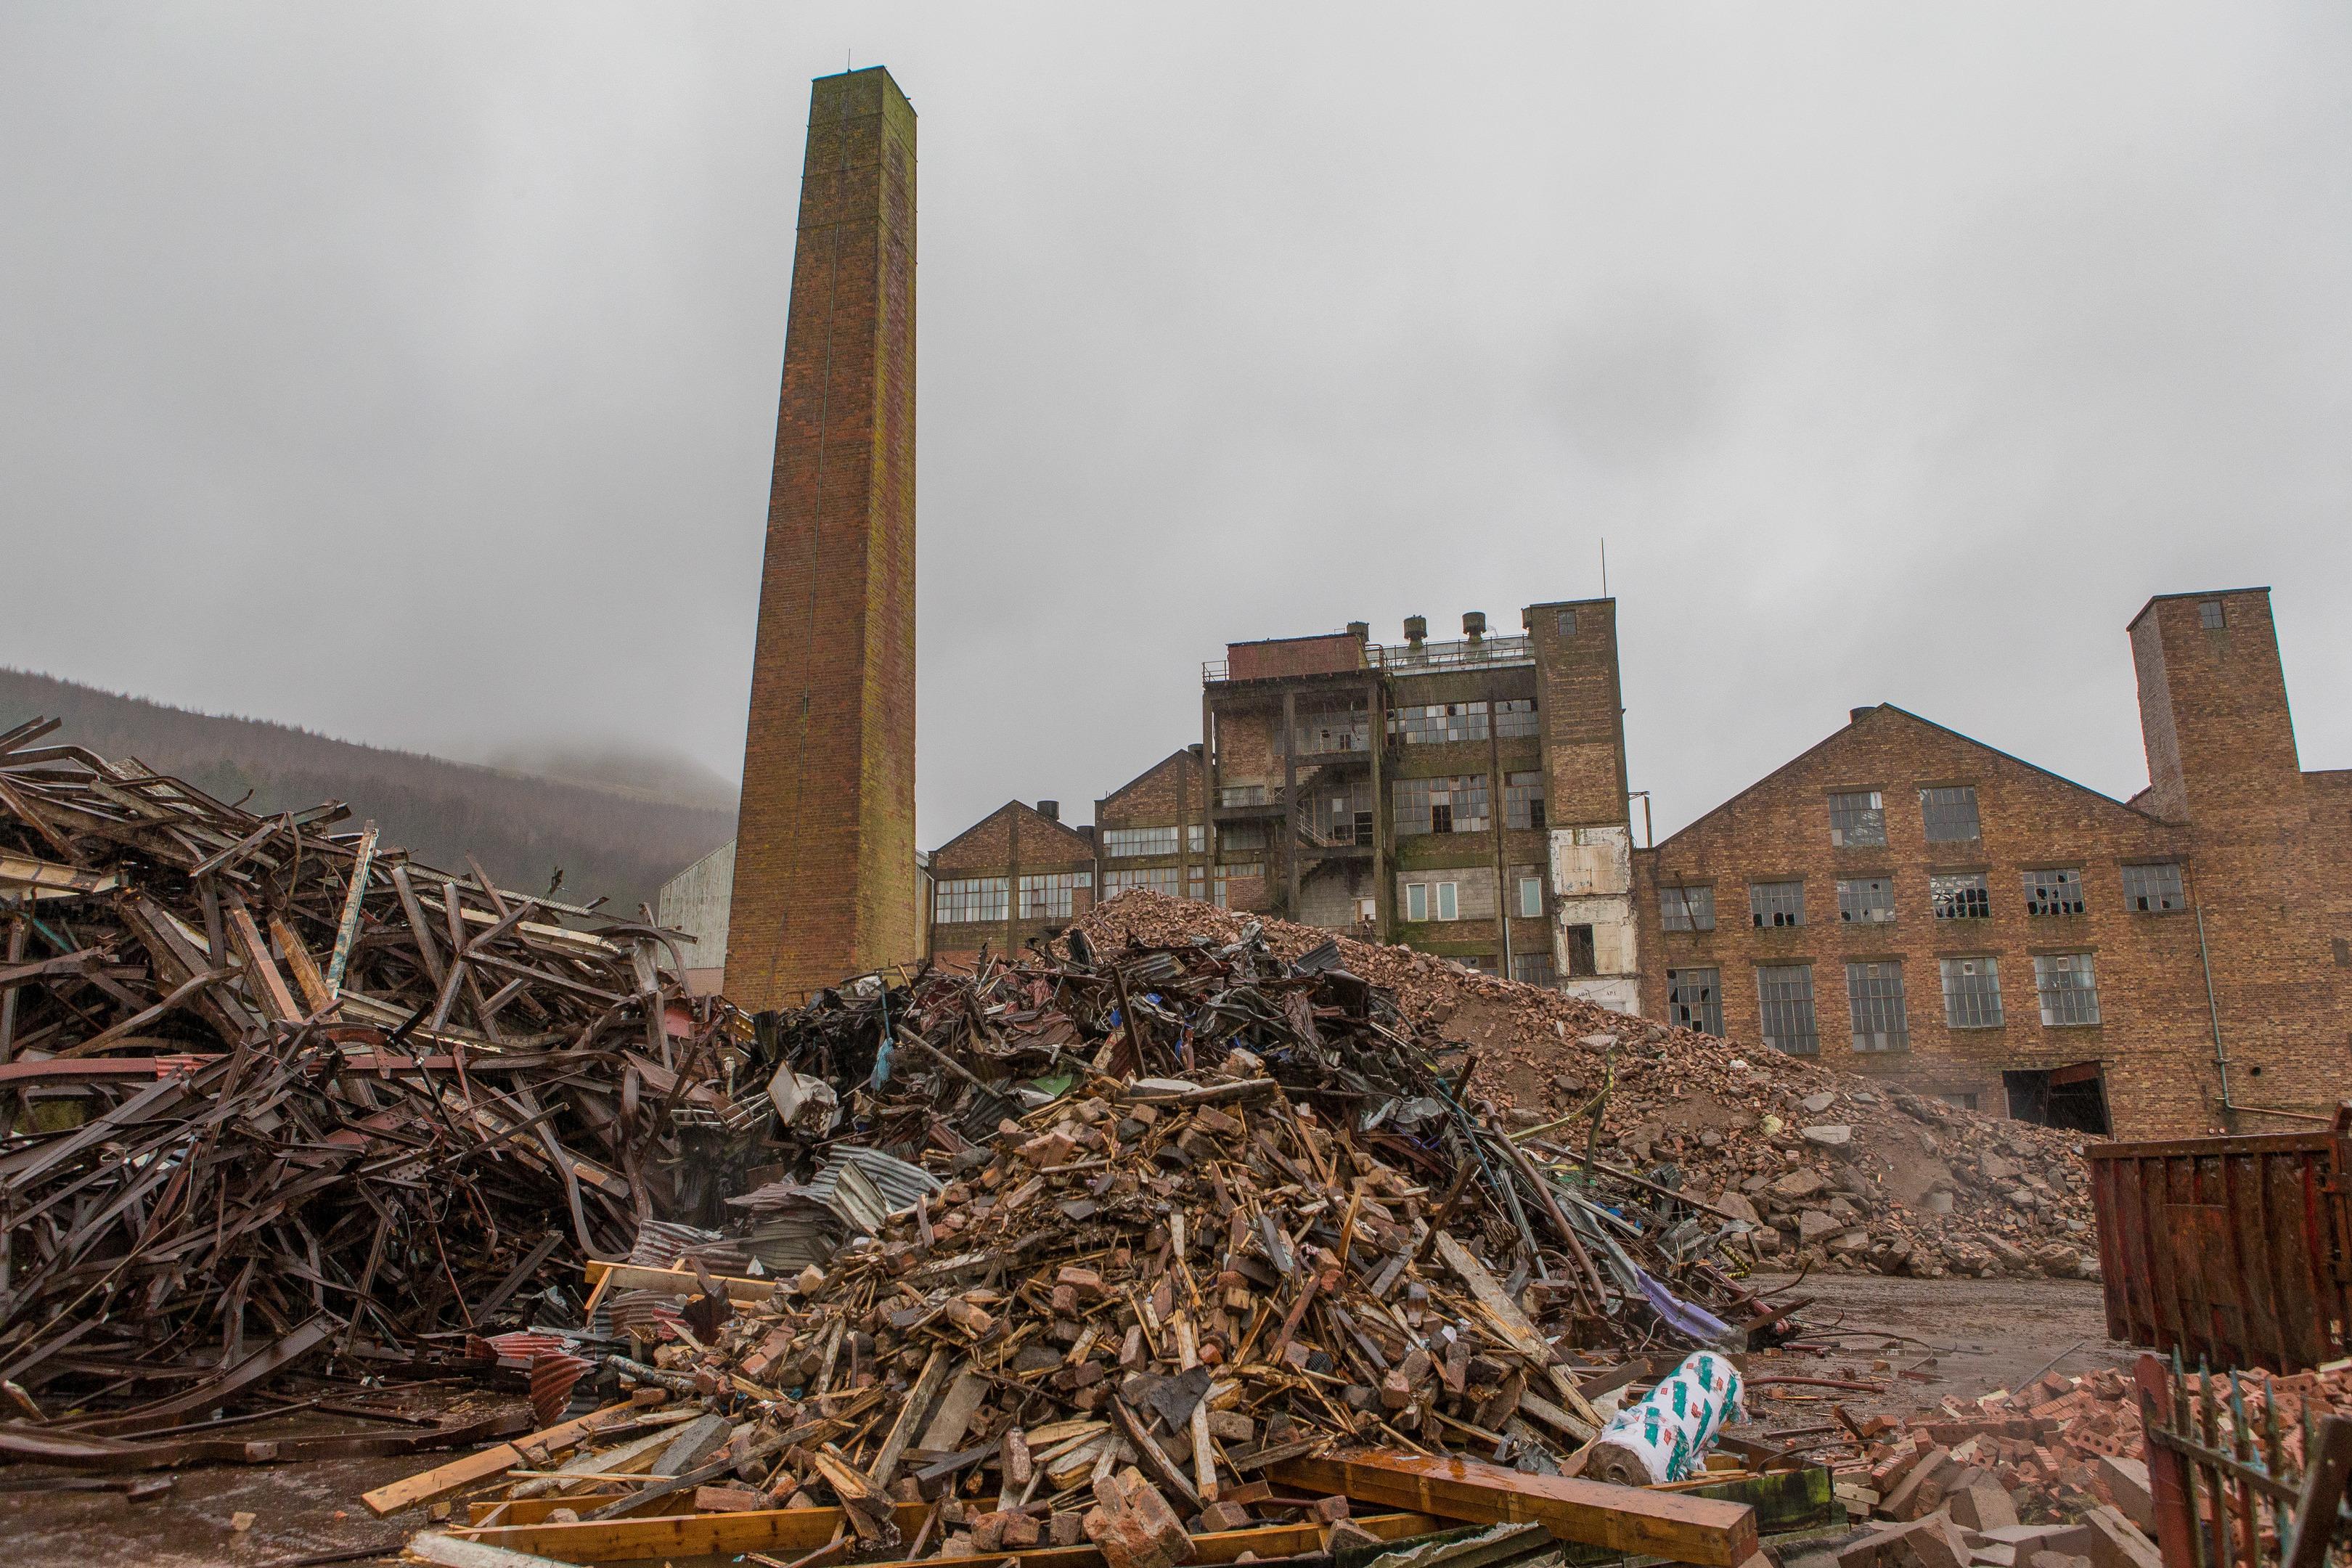 The chimney at St John's Works, Falkland